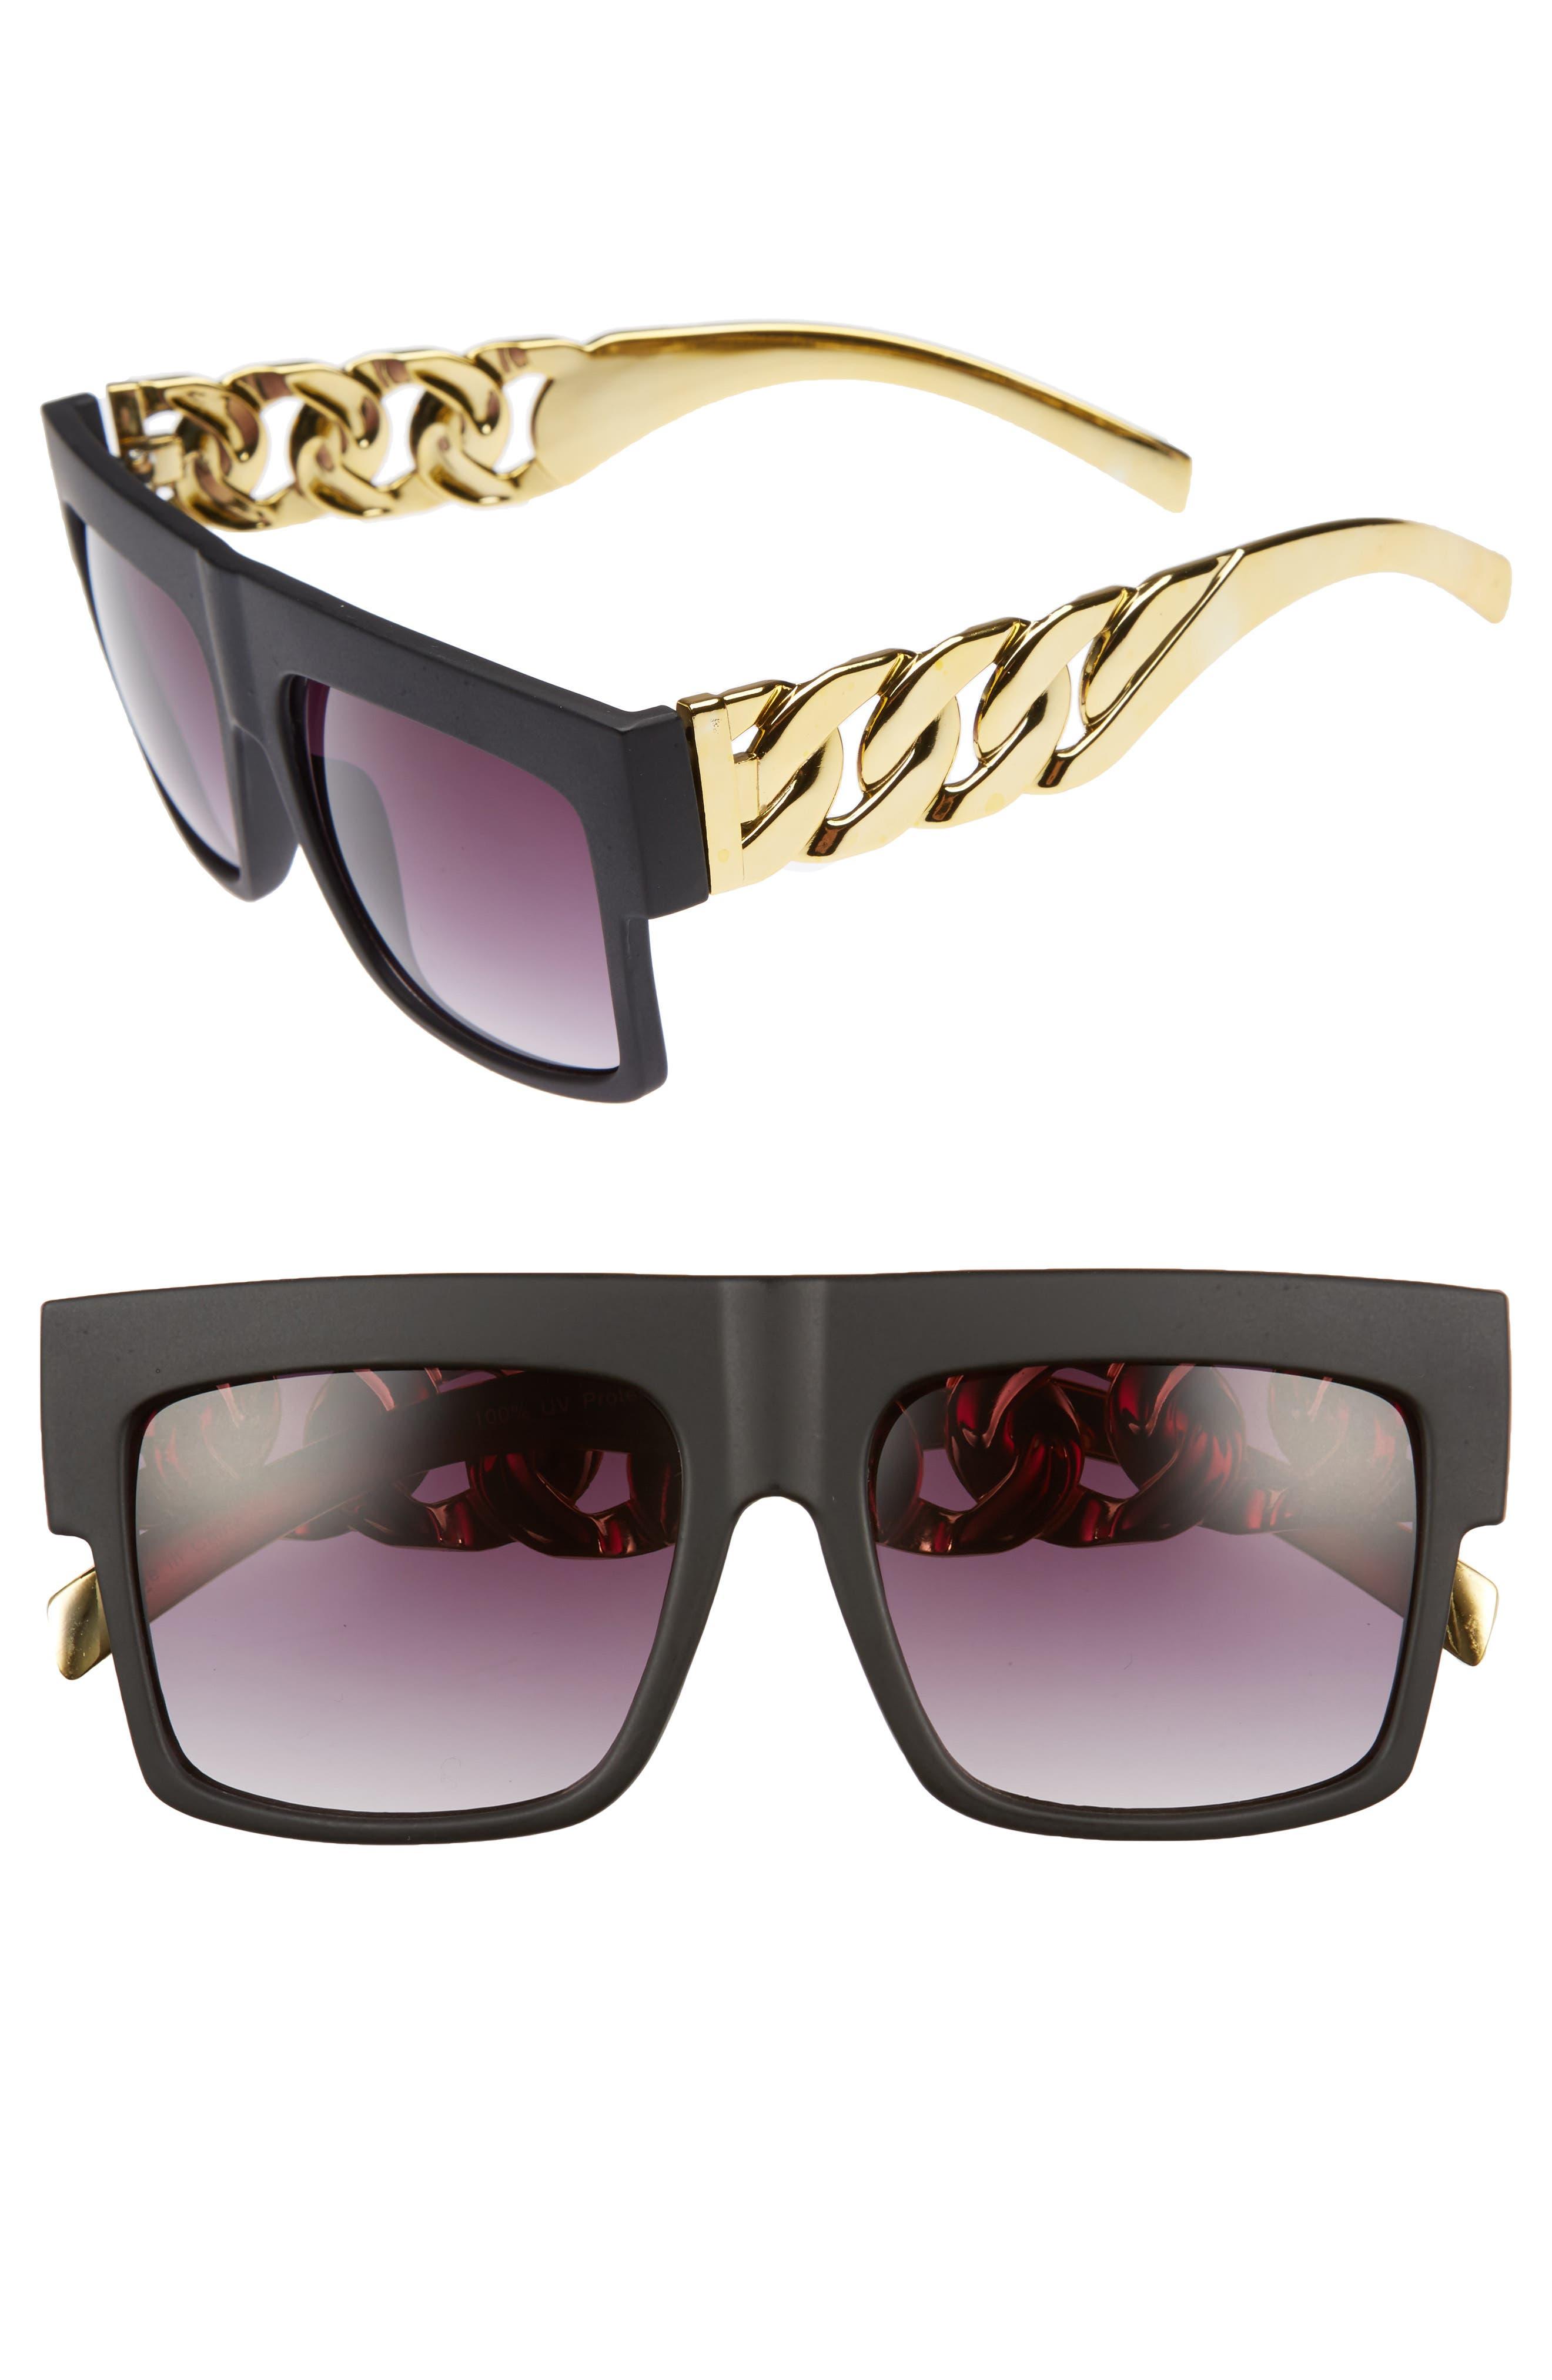 52mm Chain Detail Shield Sunglasses,                             Main thumbnail 1, color,                             Black/ Gold